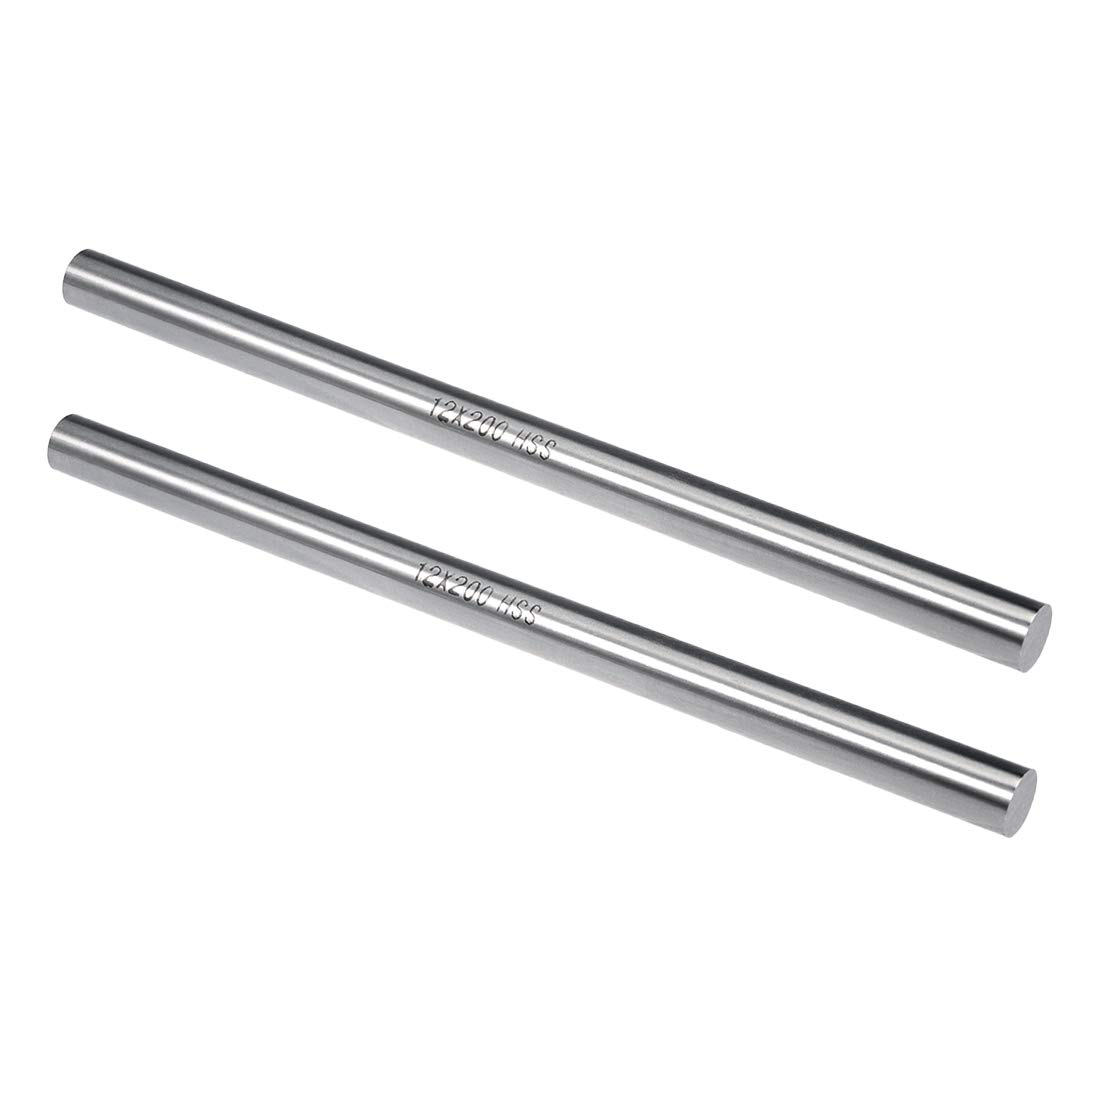 for Shaft Miniature Axle DIY Craft Tool 2 Pcs uxcell Round Rod 7.5mm Diameter 200mm Length HSS Lathe Bar Stock